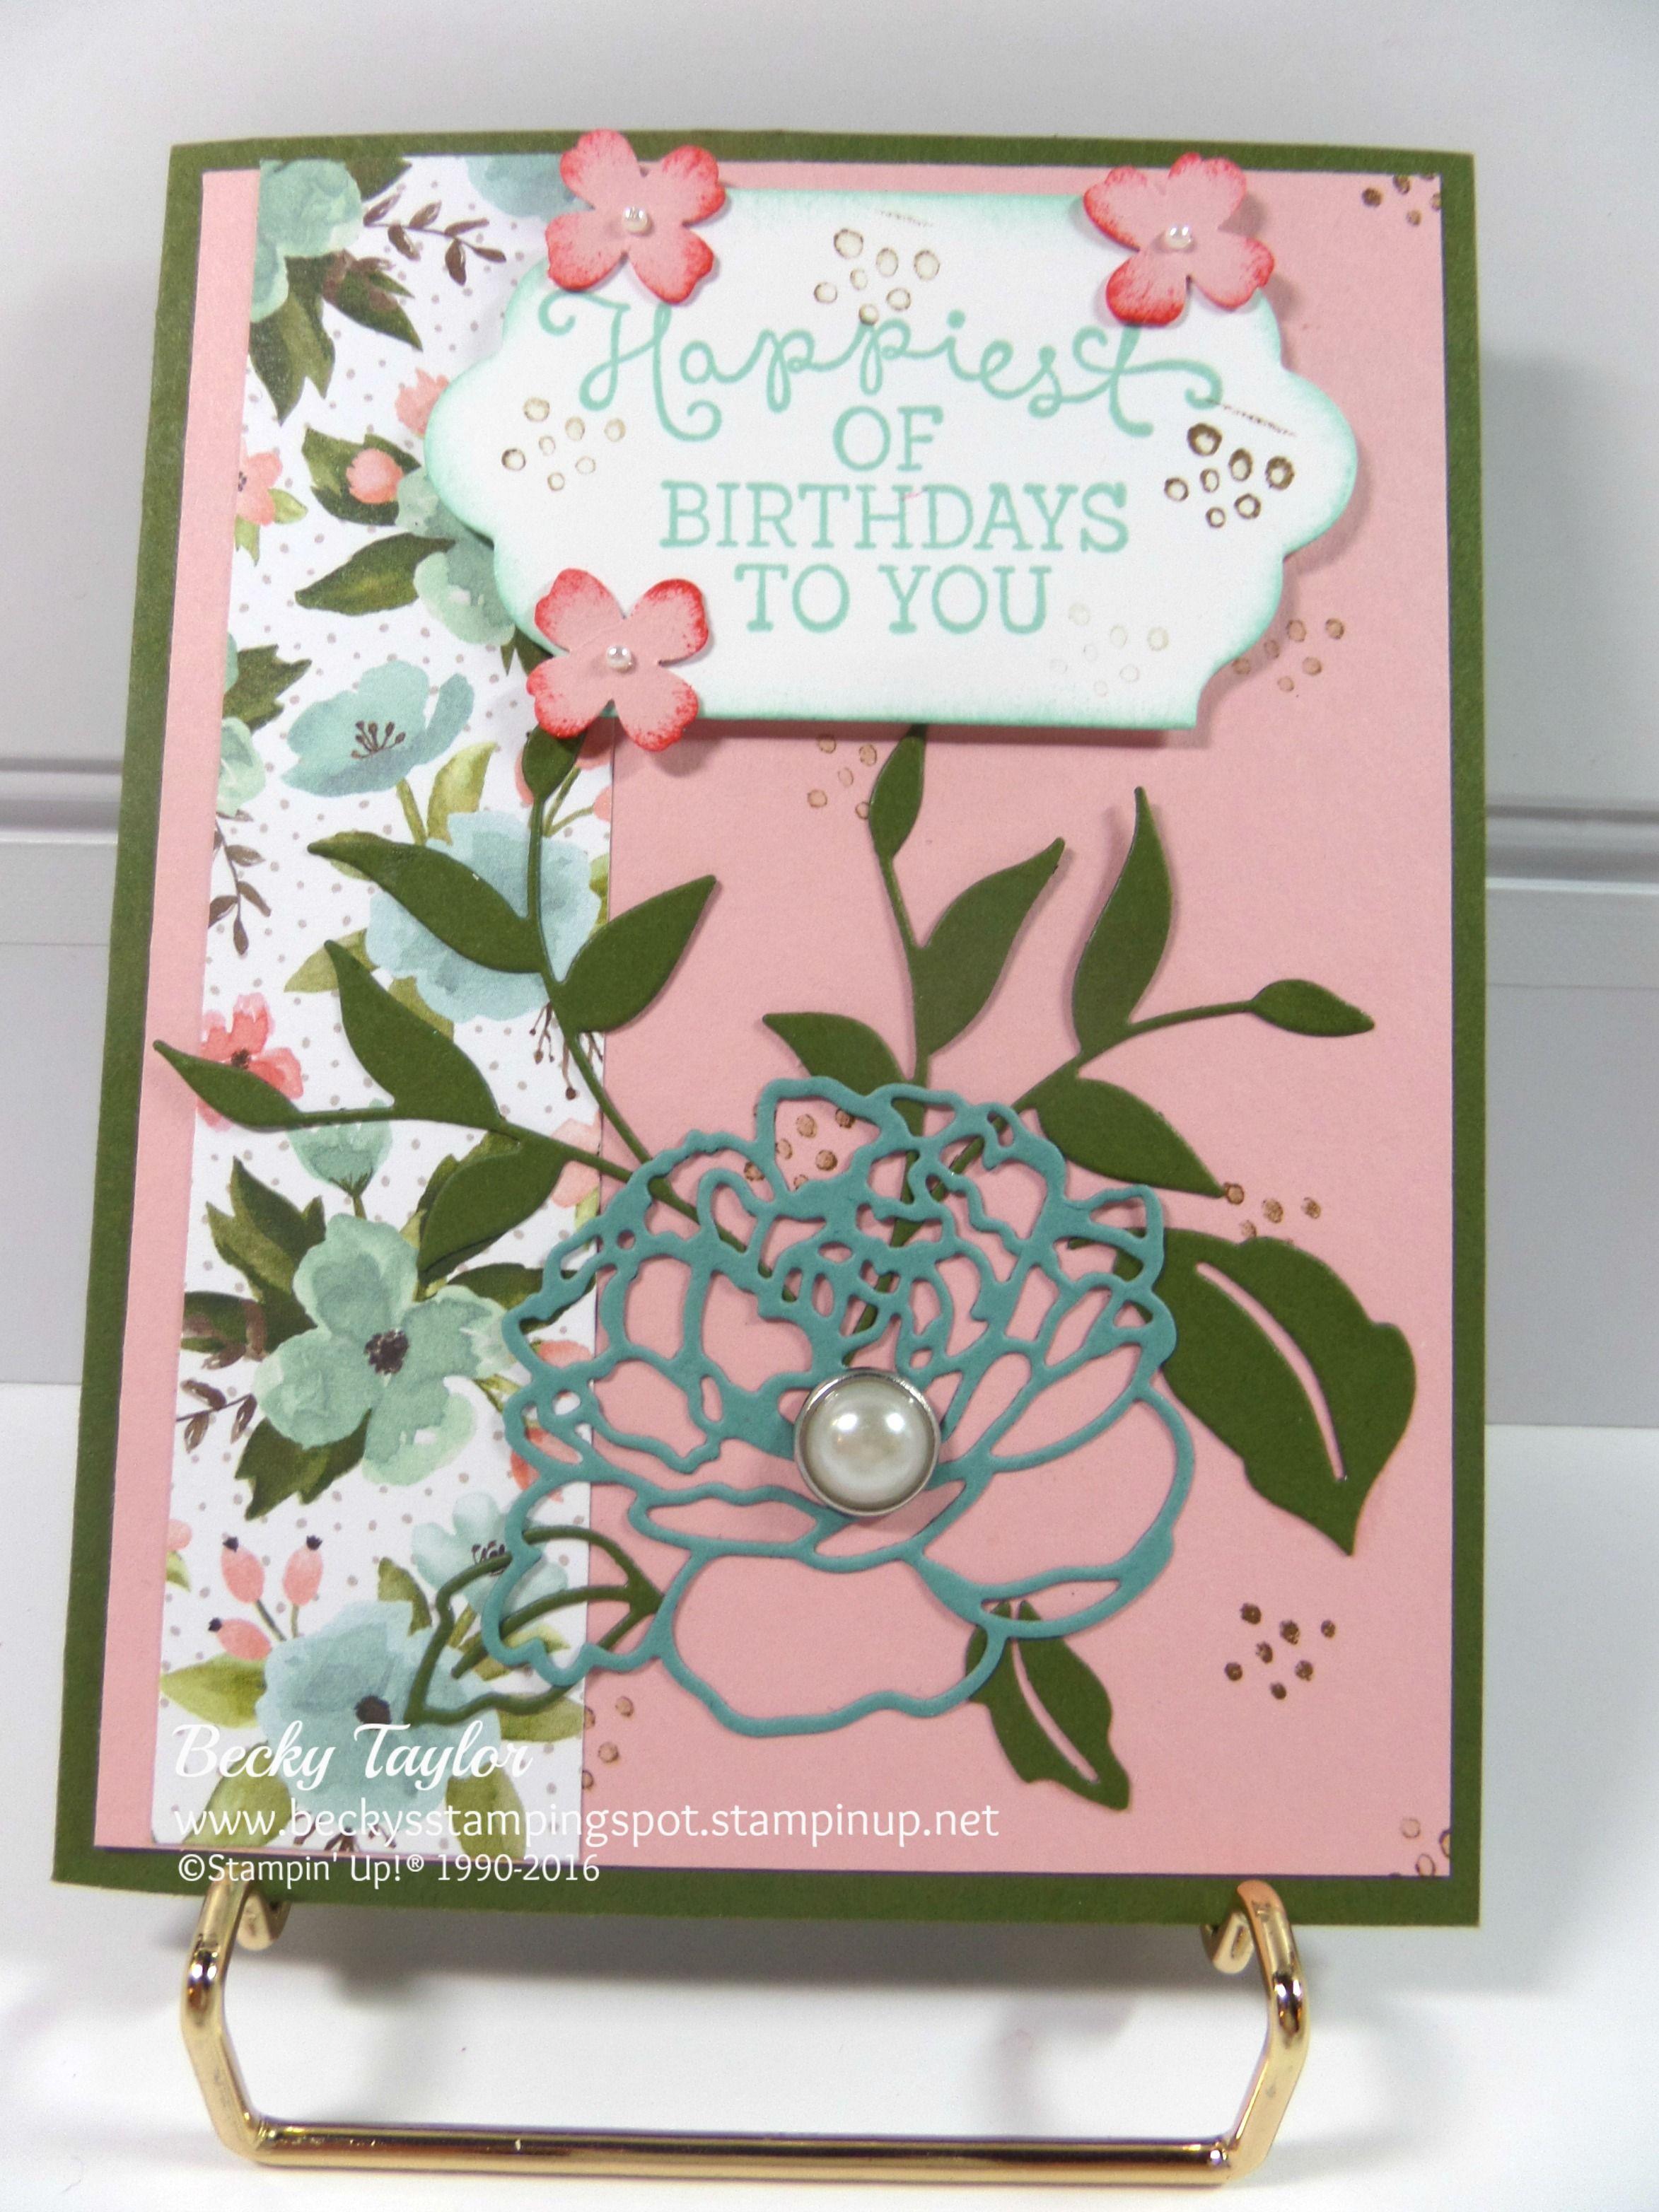 Birthday Blooms, Birthday Bouquet DSP stampinup